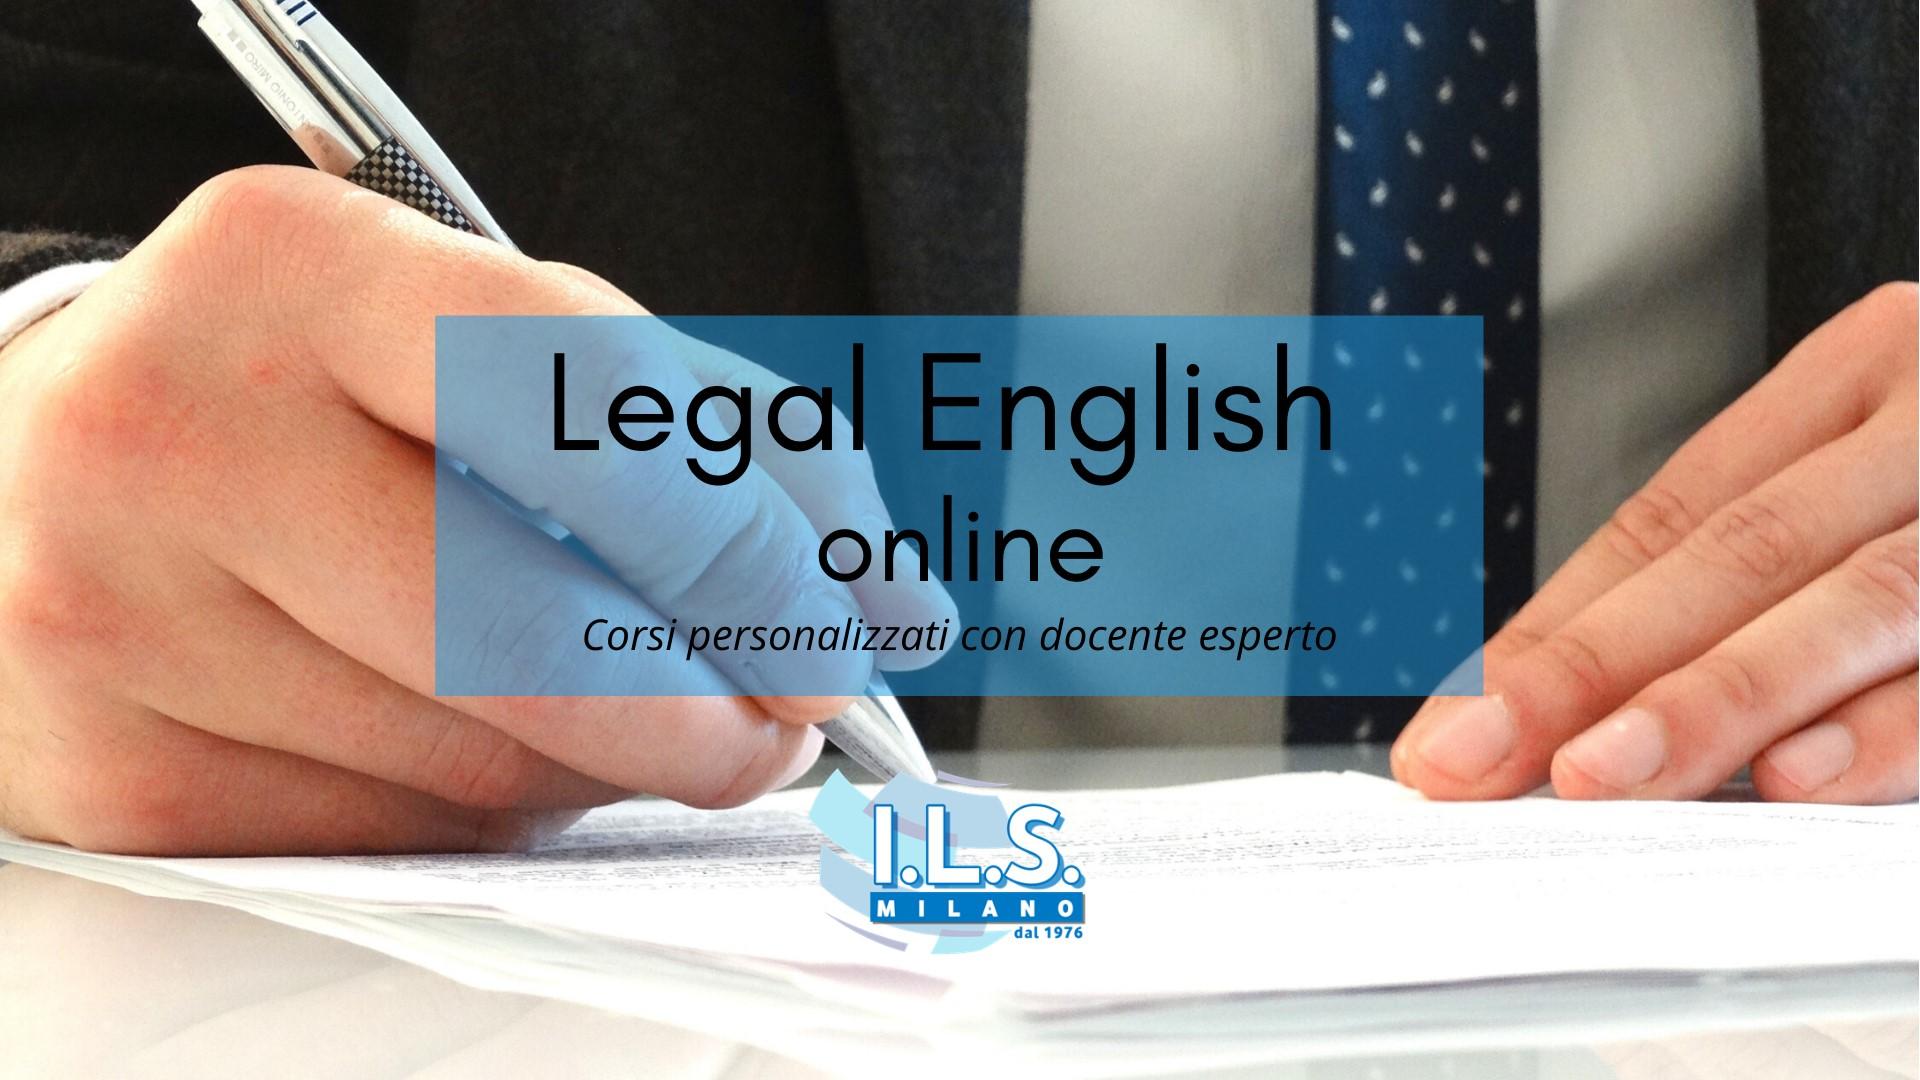 Legal English online ils milano inglese giuridico a distanza international language school milano